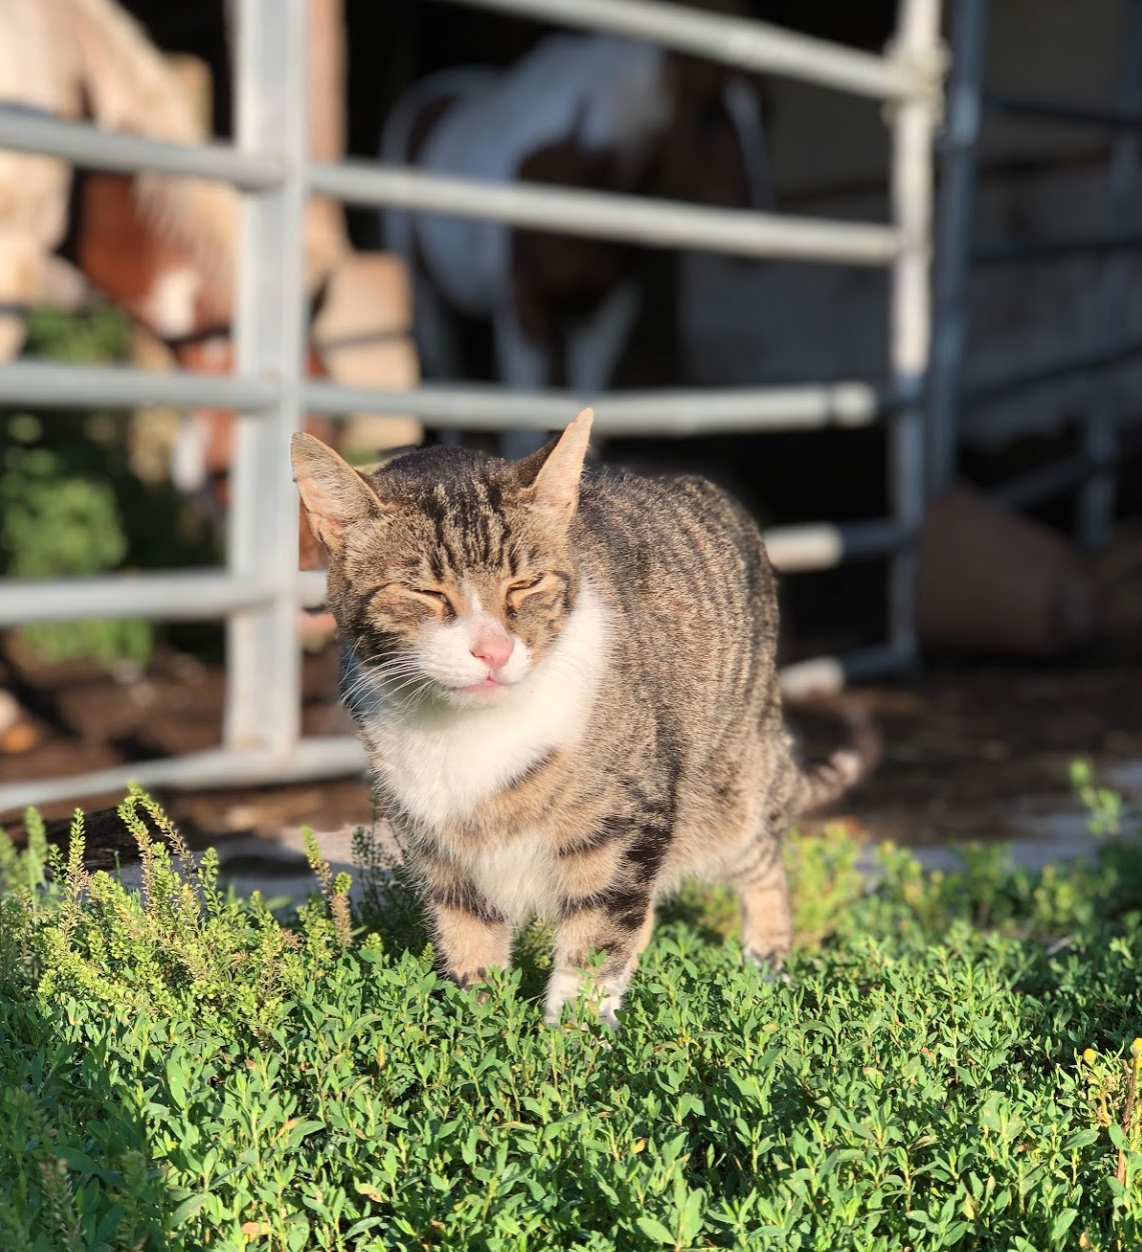 Barn cat. August 2019.